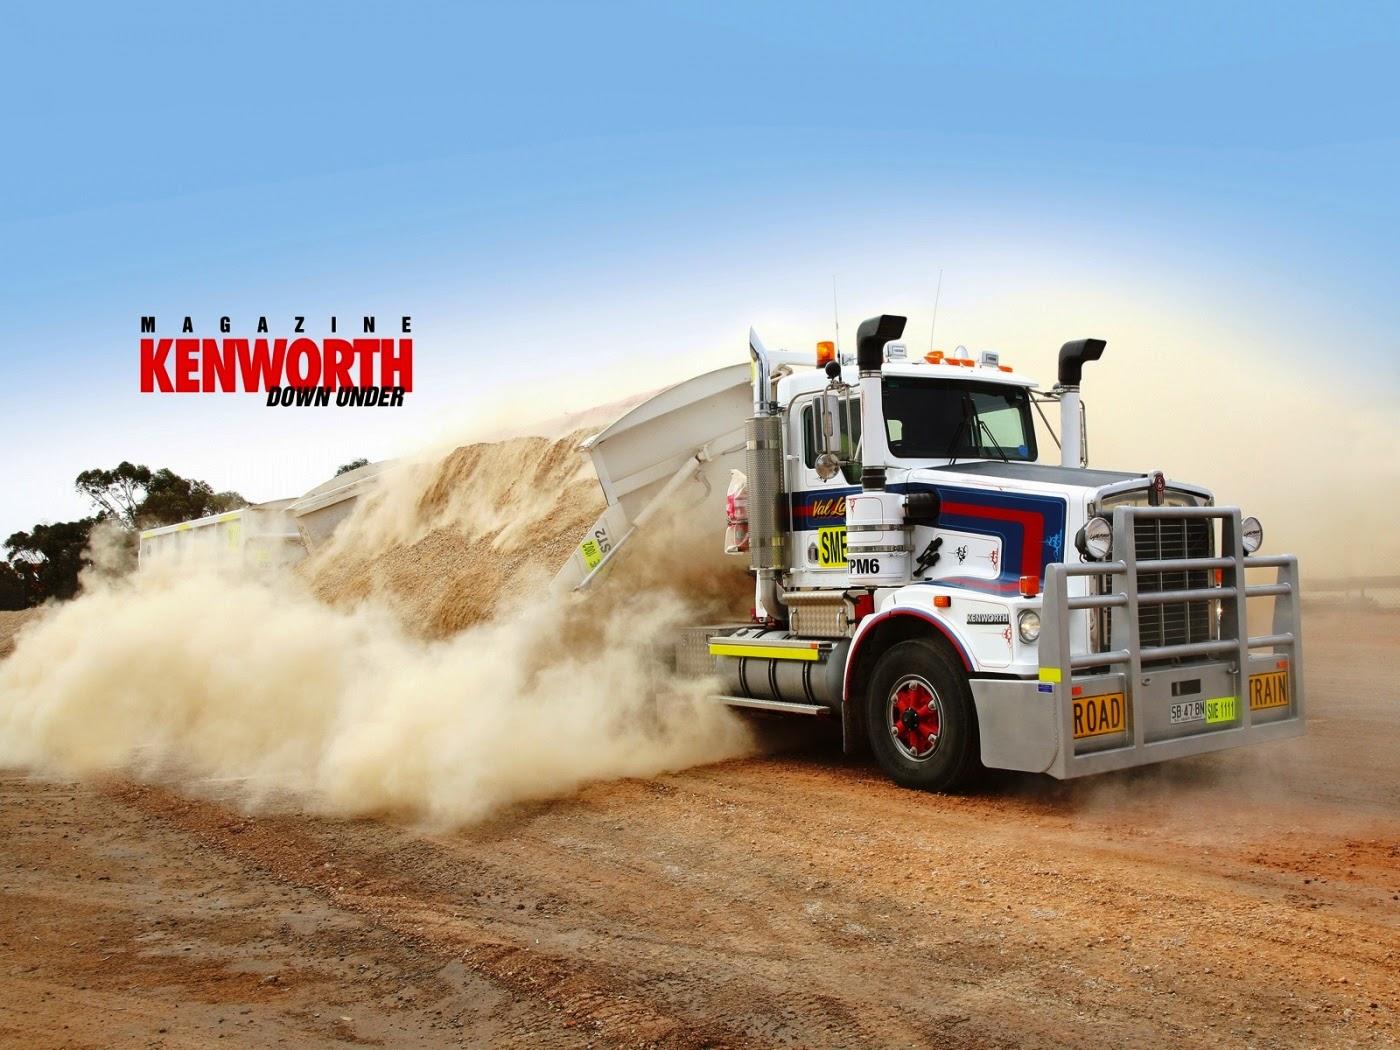 stock photography Kenworth Truck Desktop Wallpapers Stock Photos 1400x1050